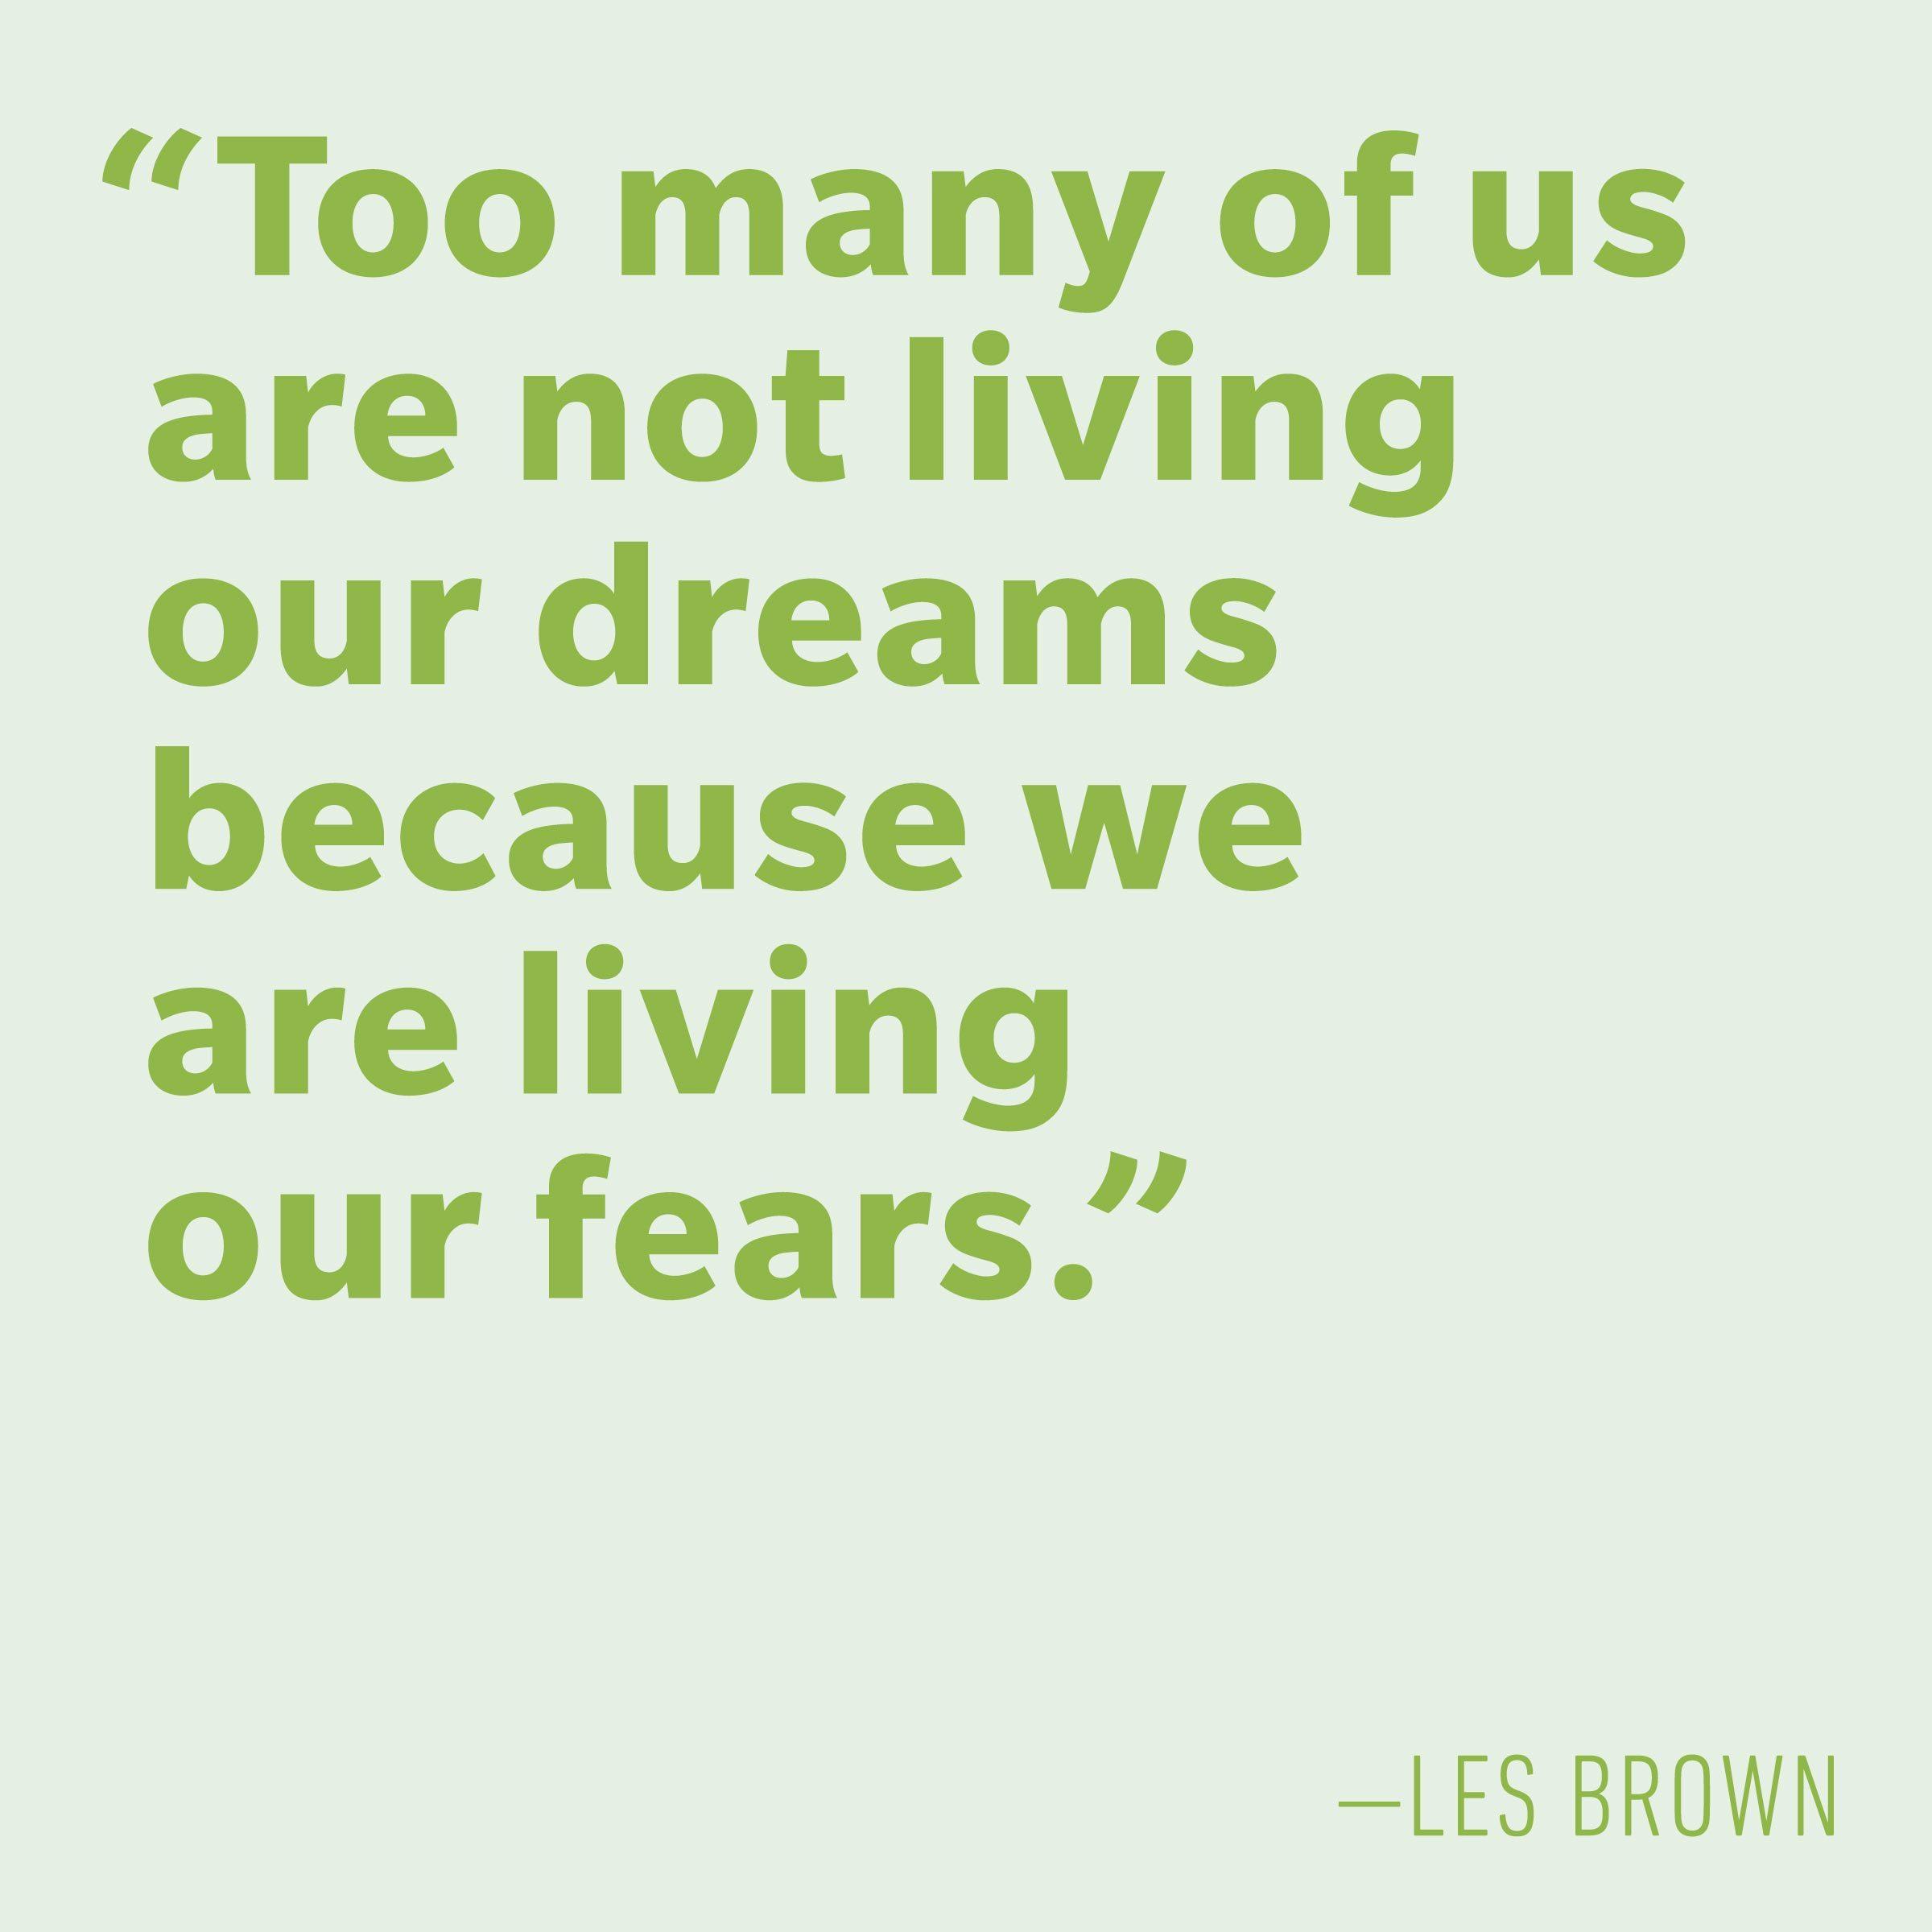 Motivational quotes - Les Brown